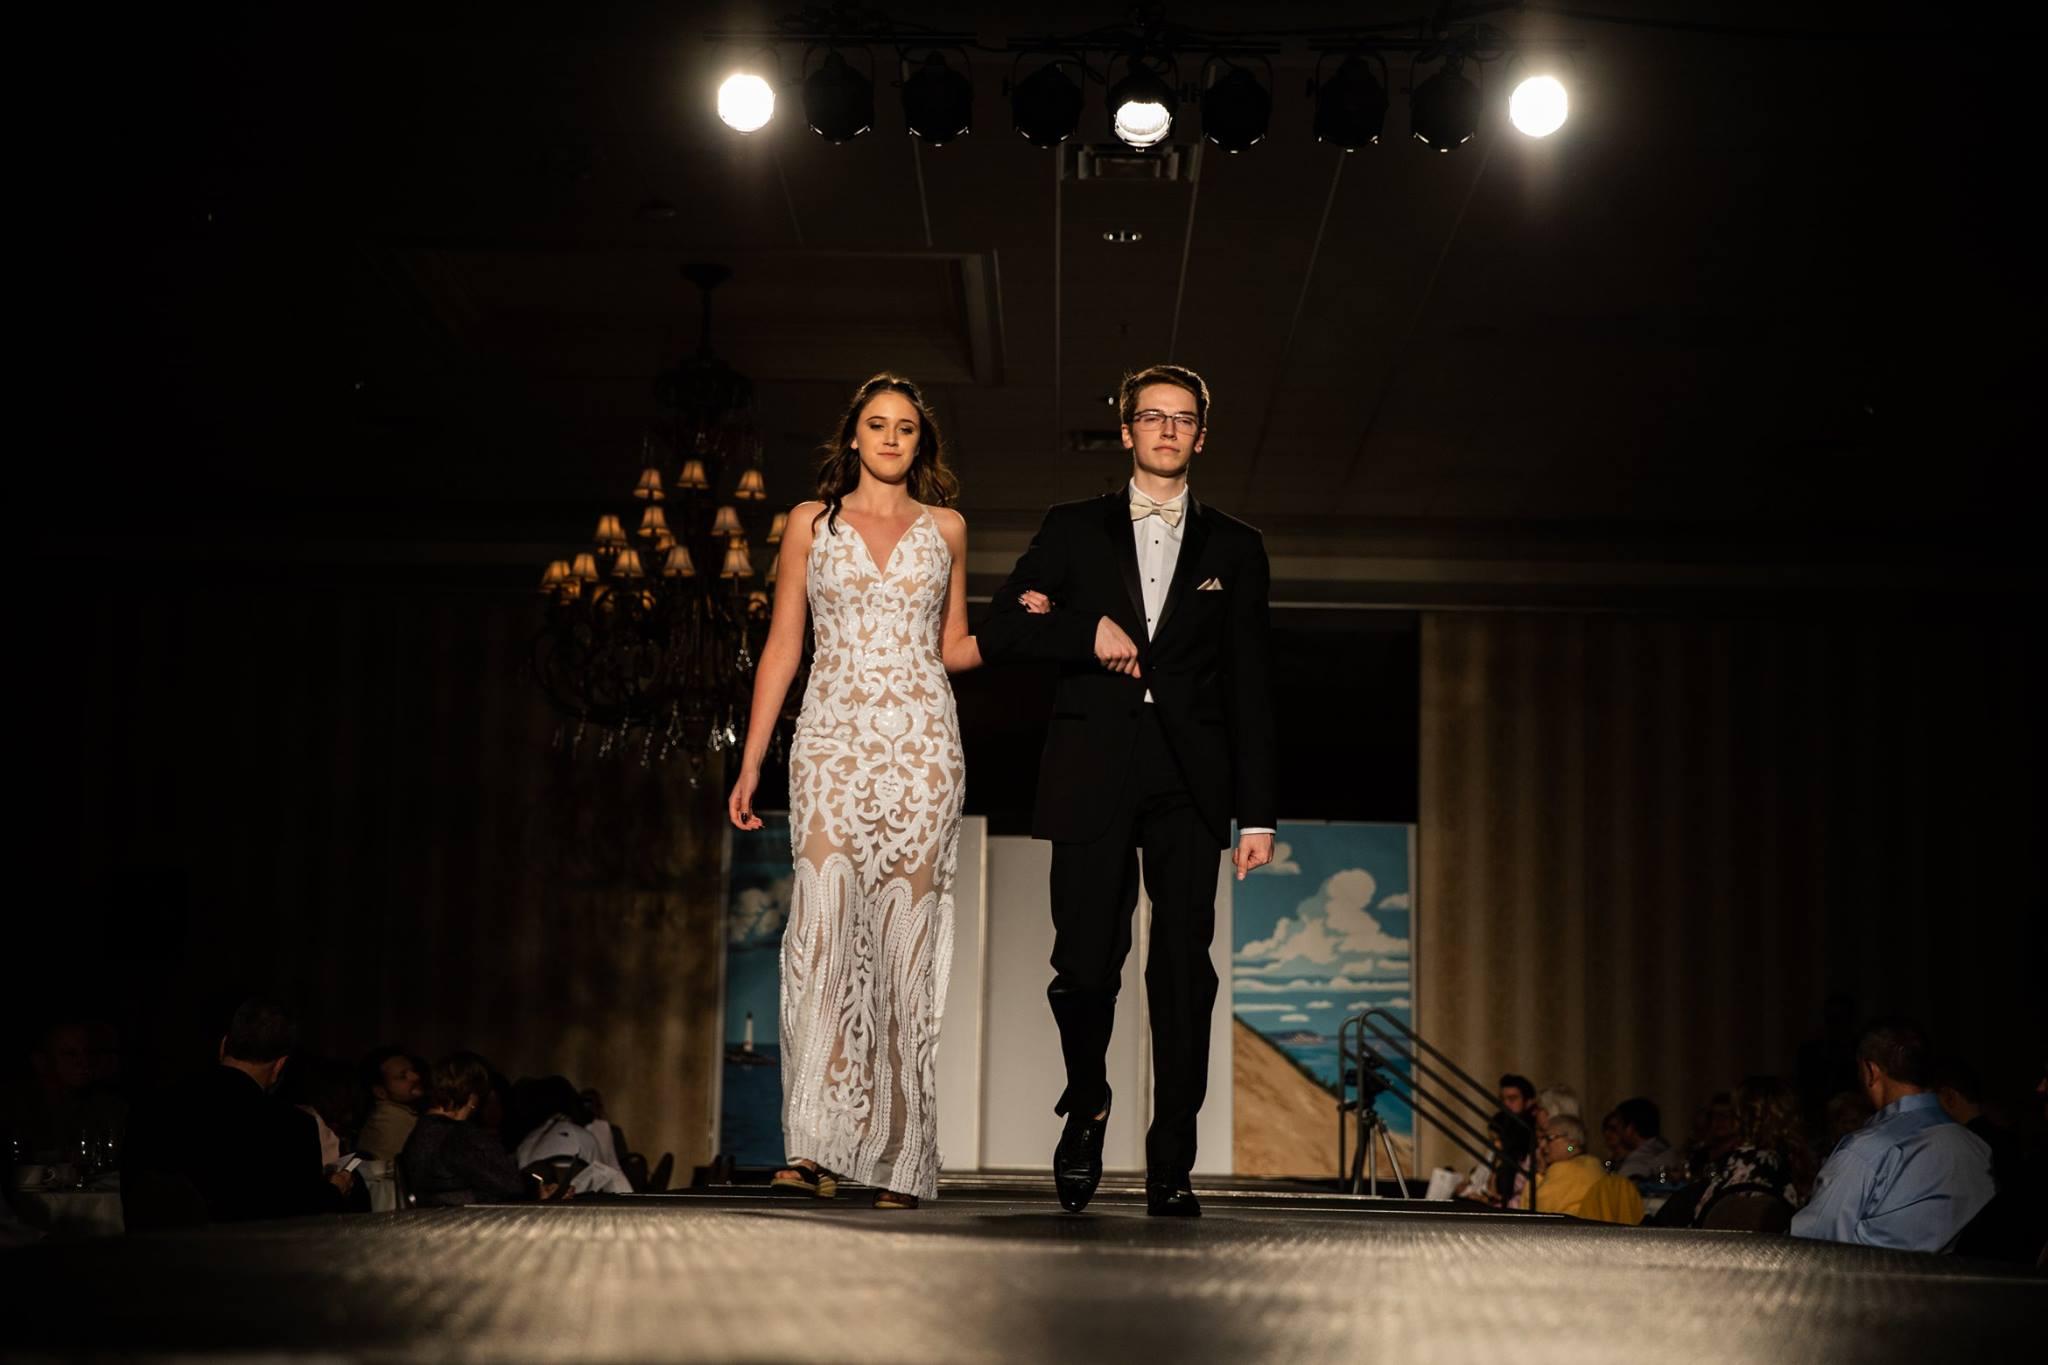 Lutheran_North_High_School_Macomb_Michigan_LHN_Fashion_Show_2019_Seniors (55).jpg